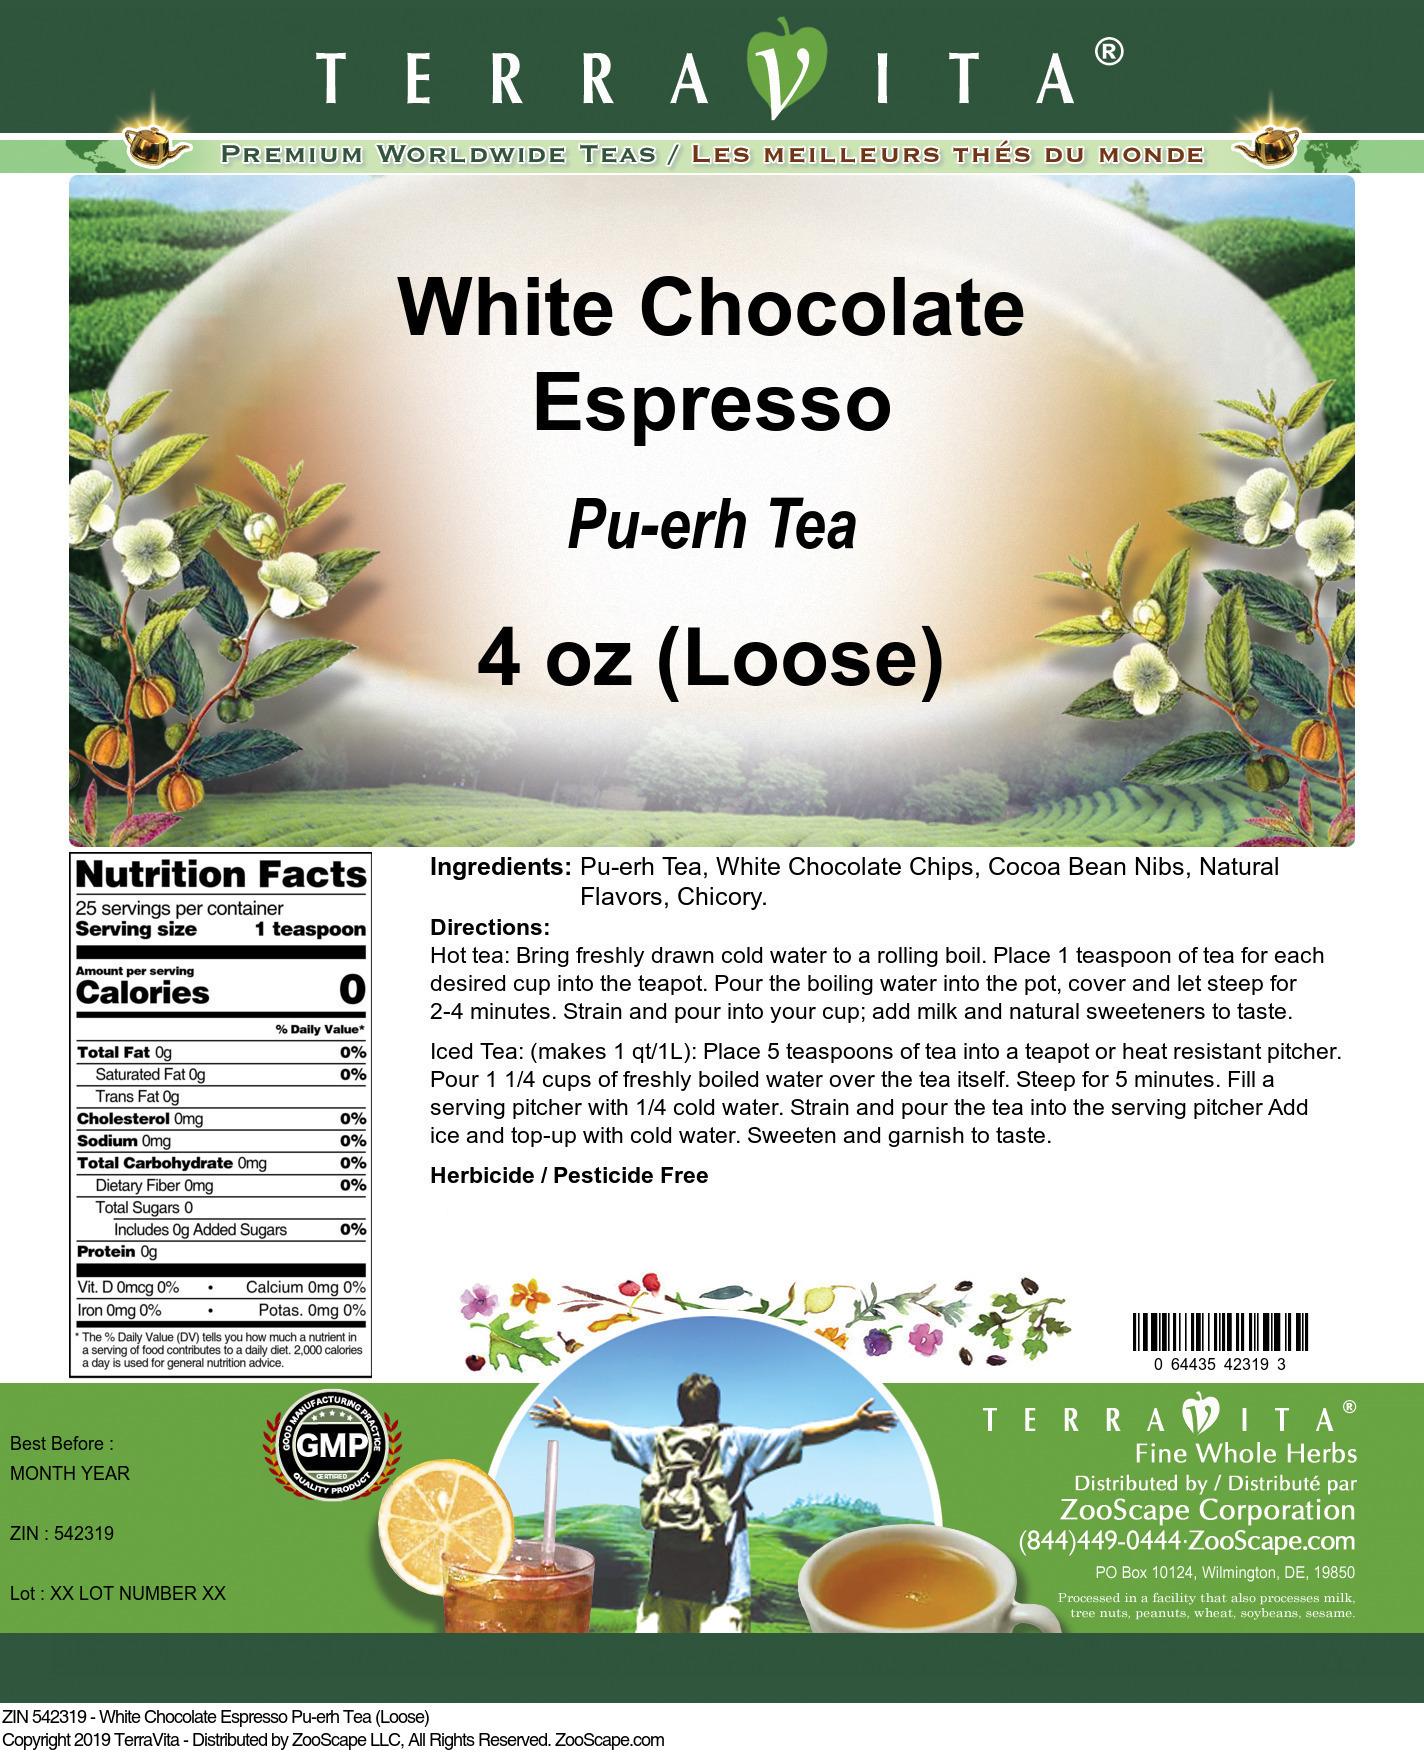 White Chocolate Espresso Pu-erh Tea (Loose)